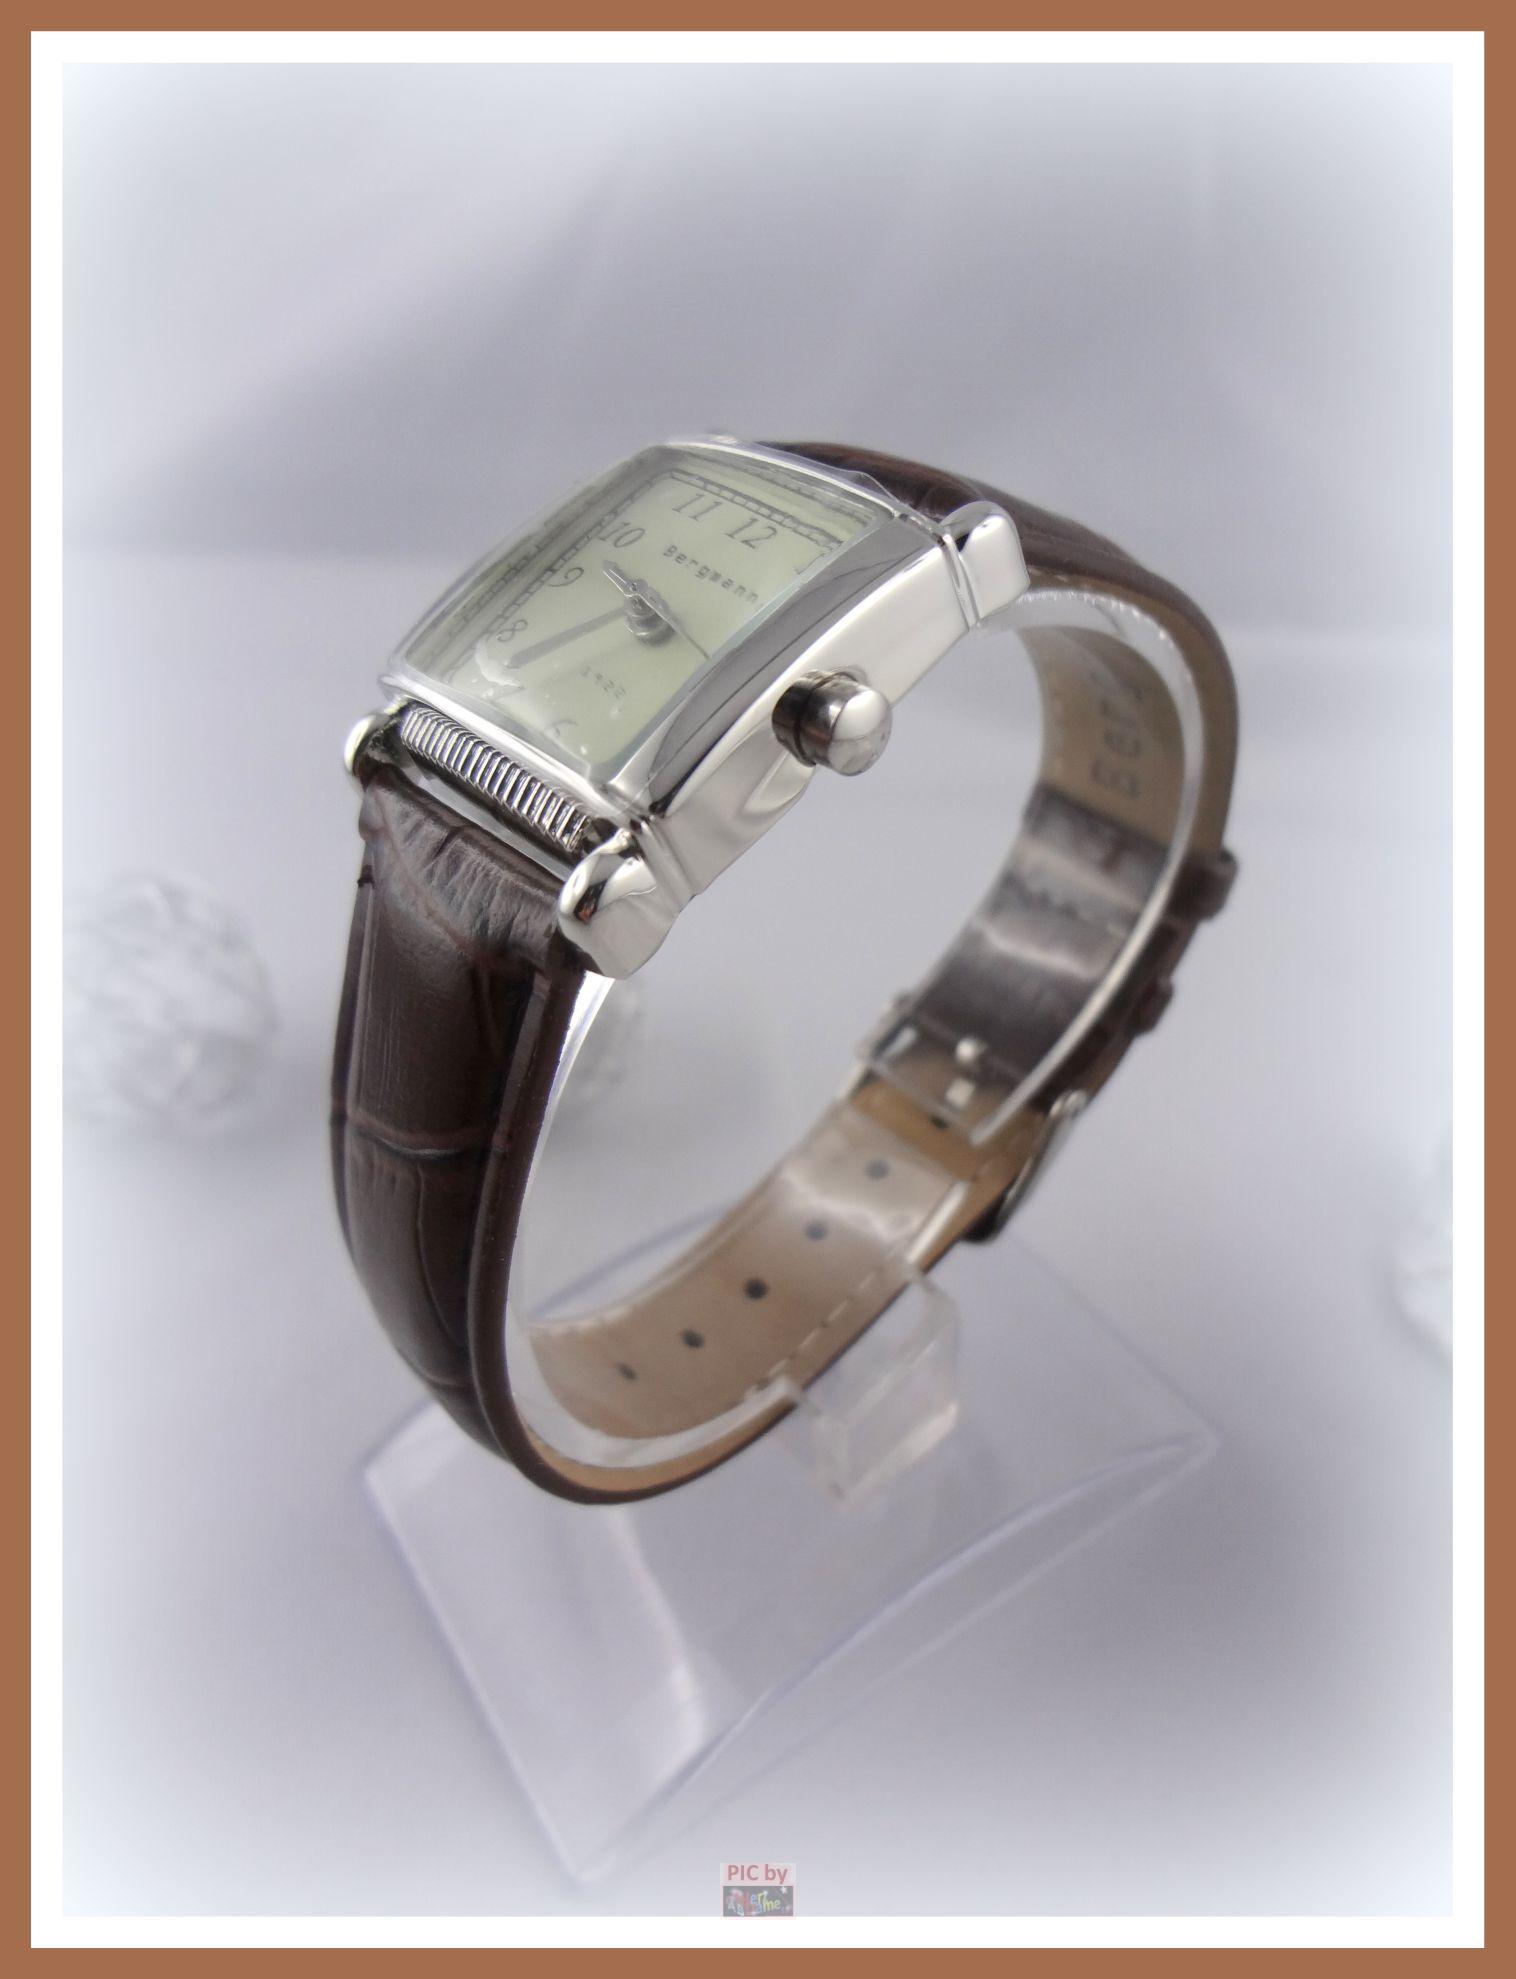 abl bergmann 1922 damenuhr uhr armbanduhr braun eckig. Black Bedroom Furniture Sets. Home Design Ideas